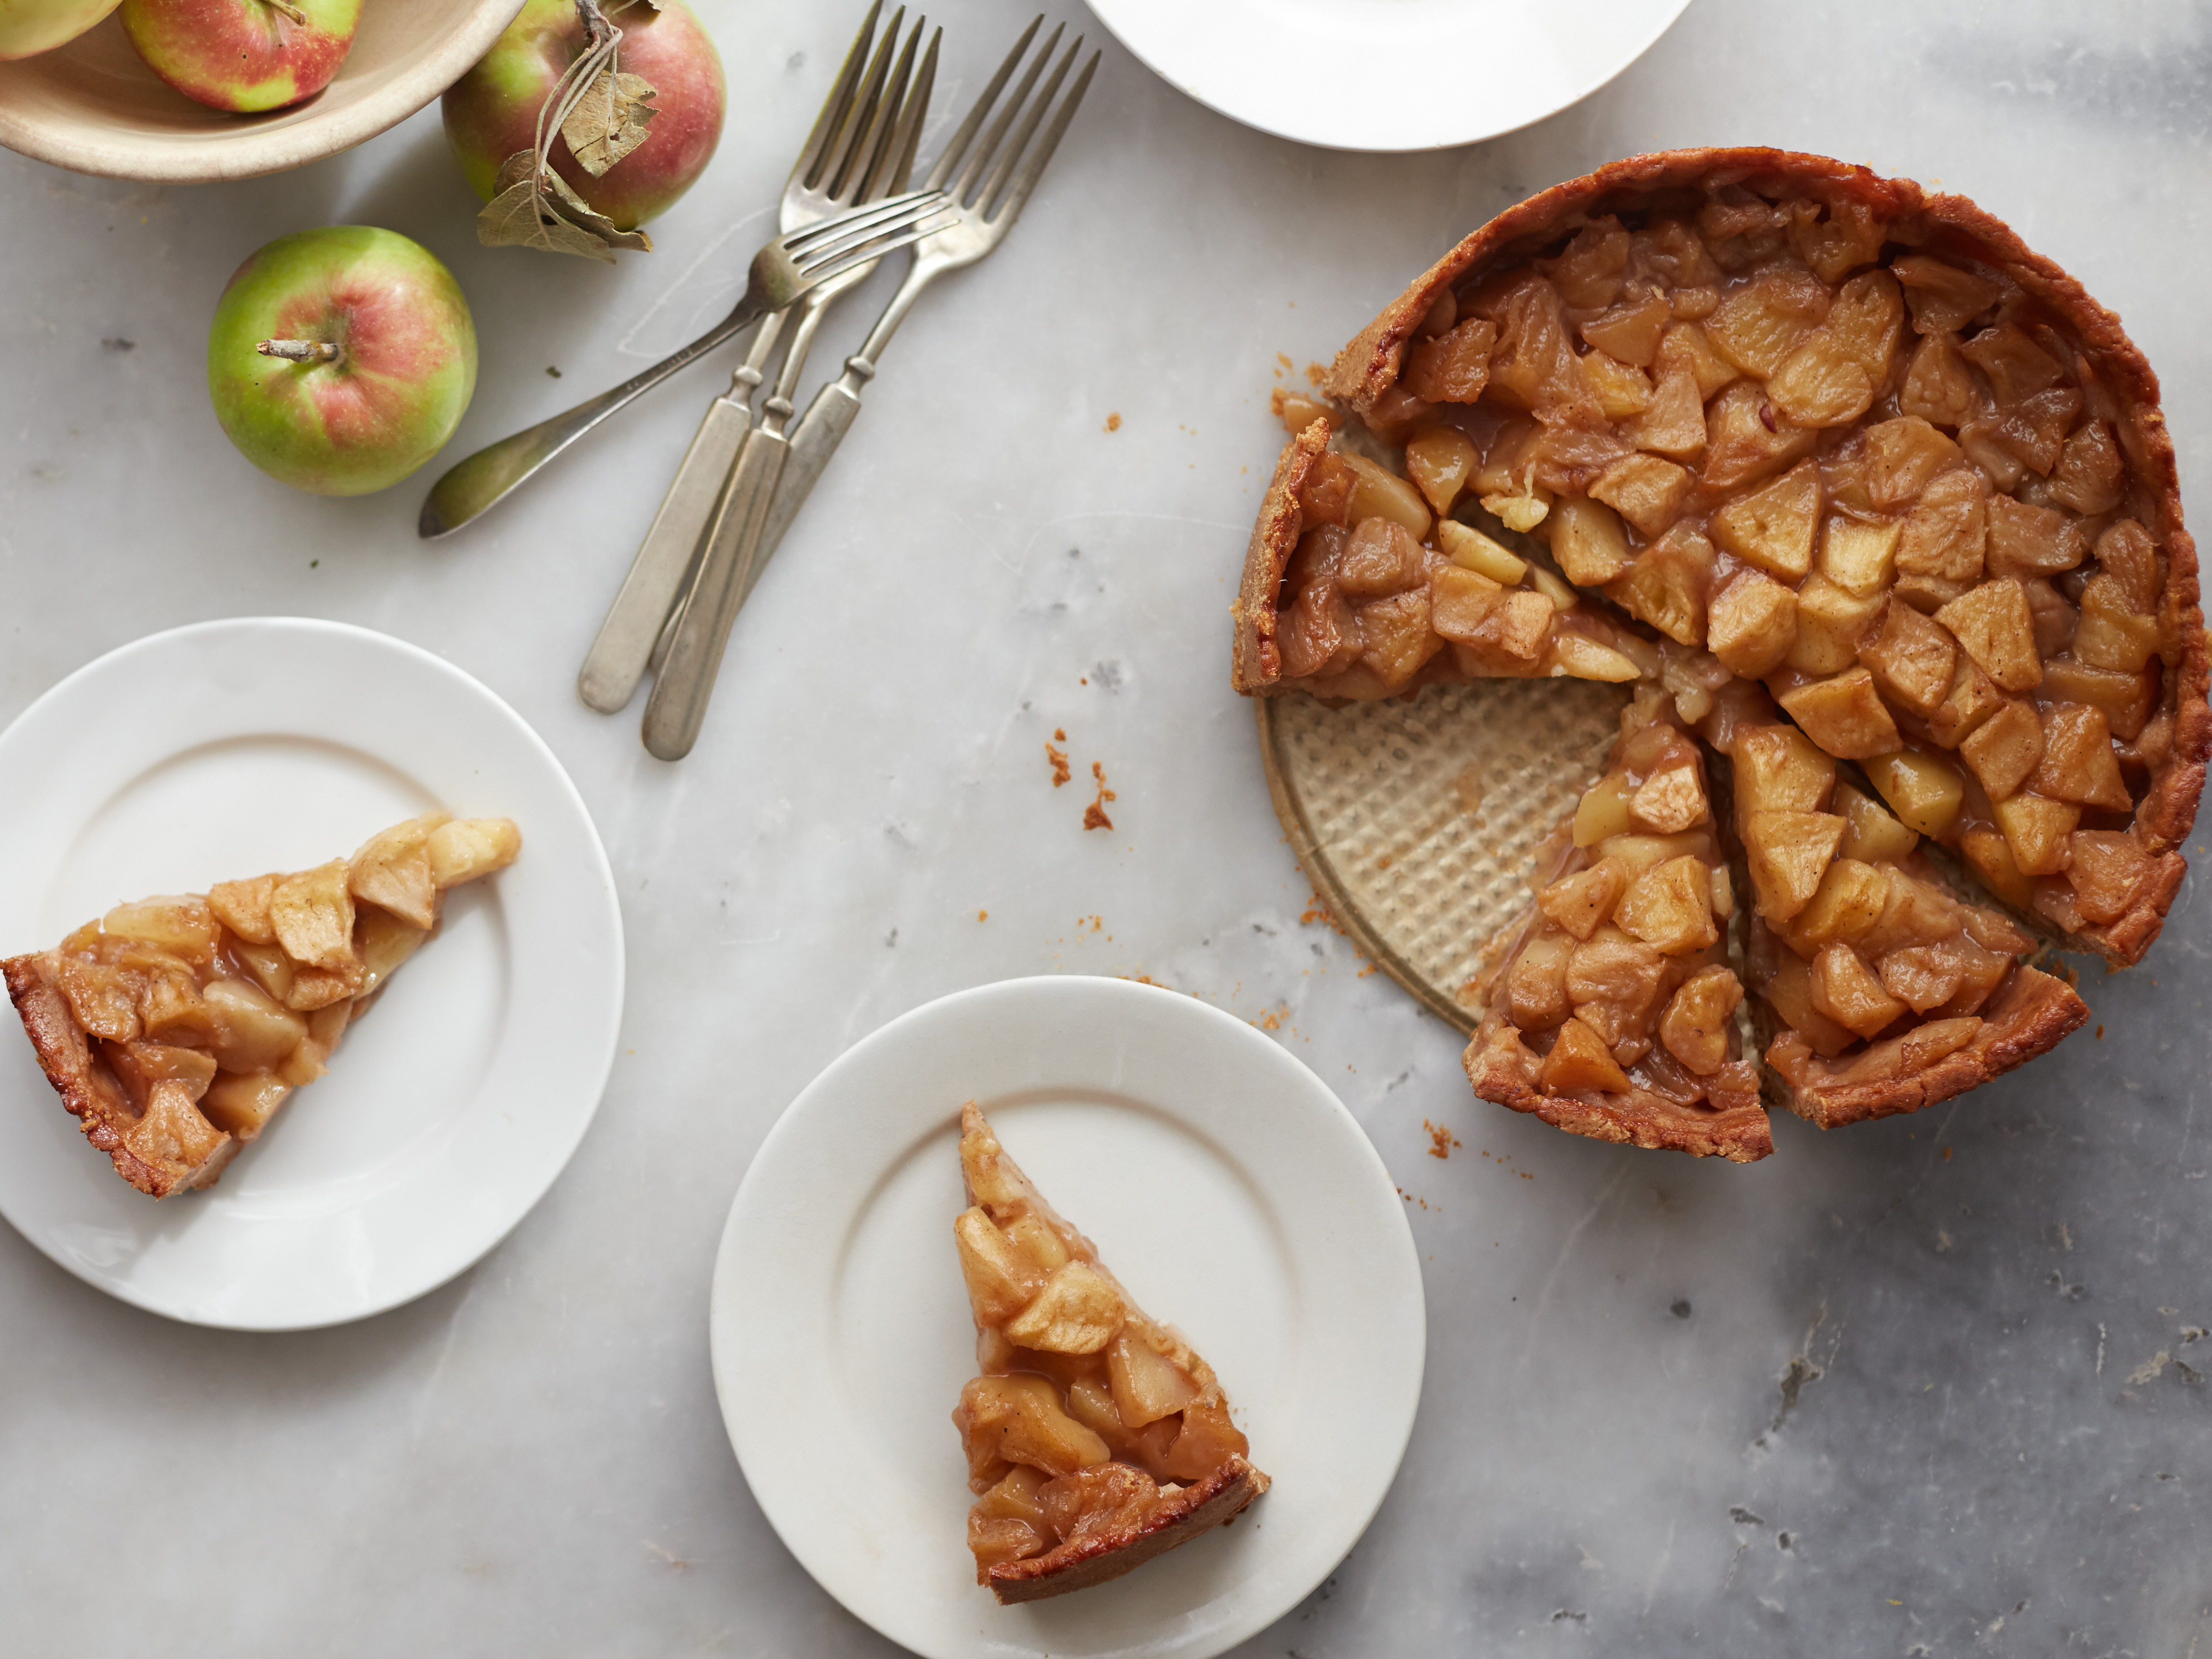 Receta: Tarta de manzana holandesa